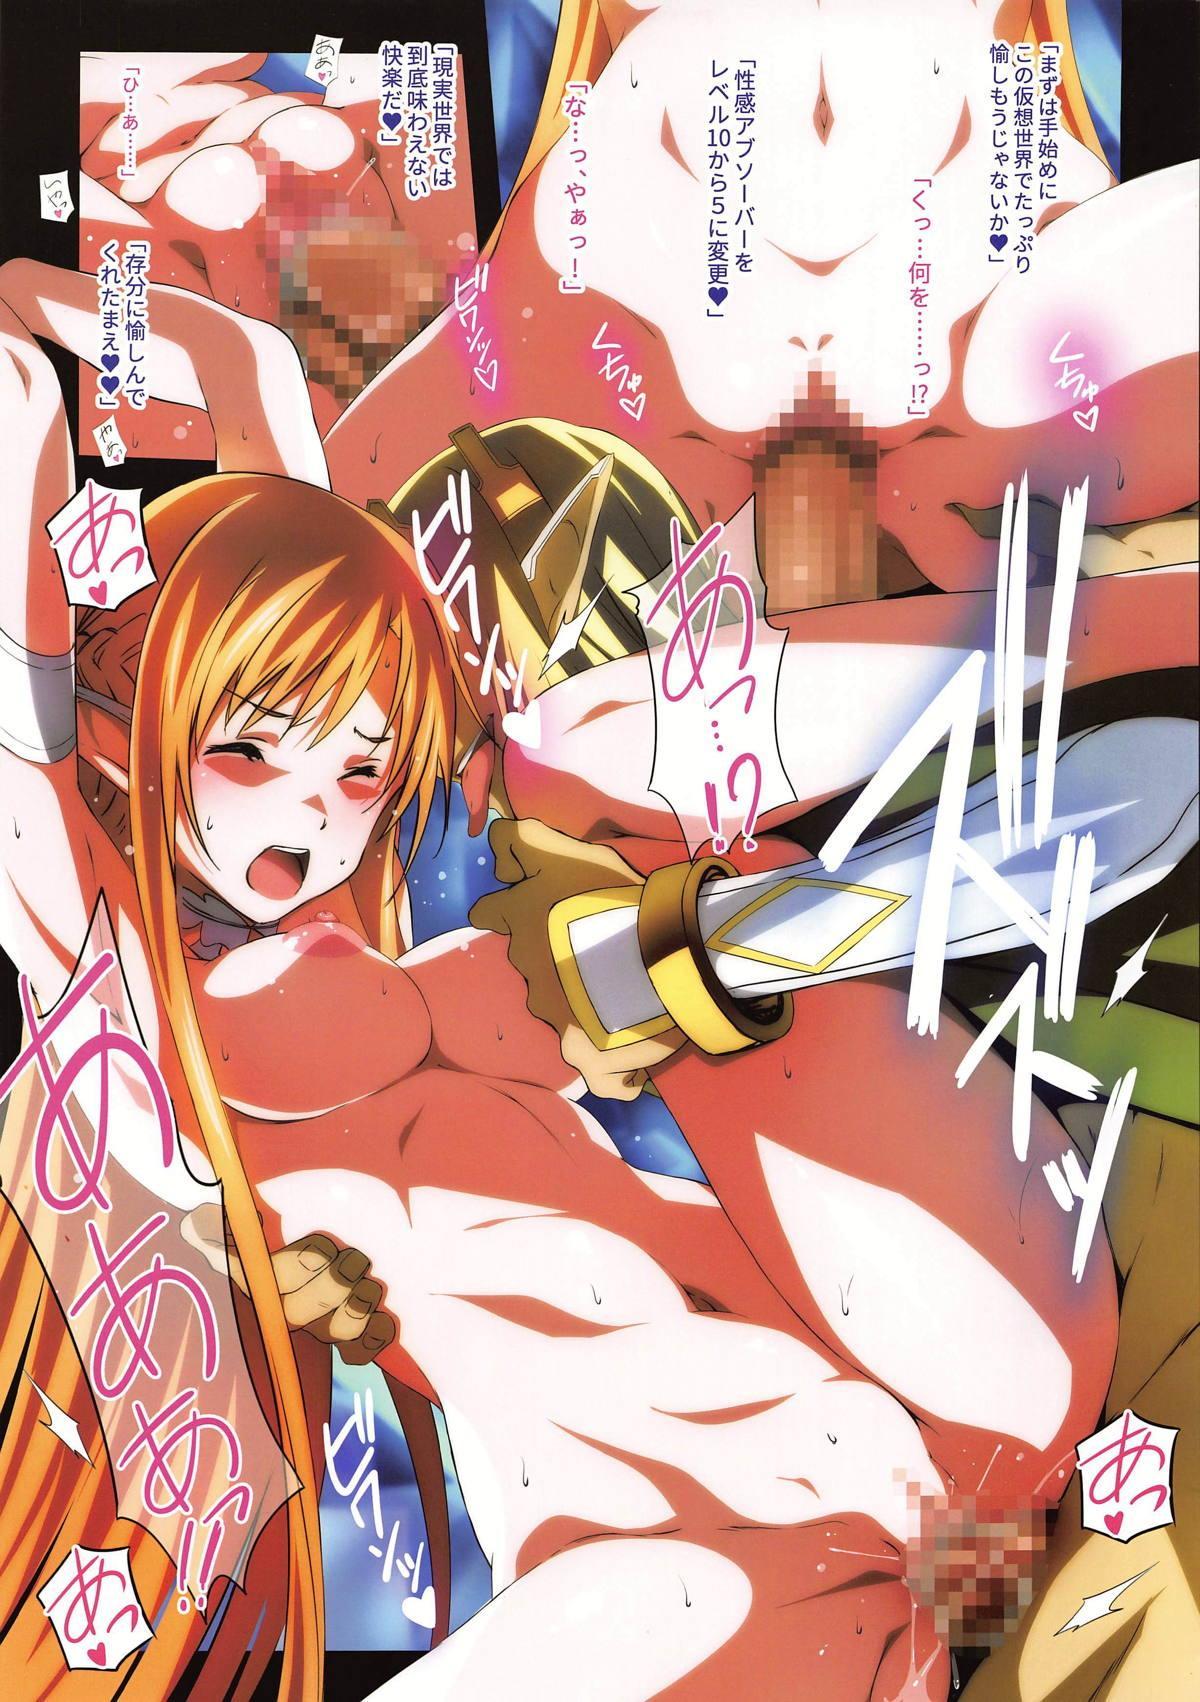 Sword Art Lilycization. 6